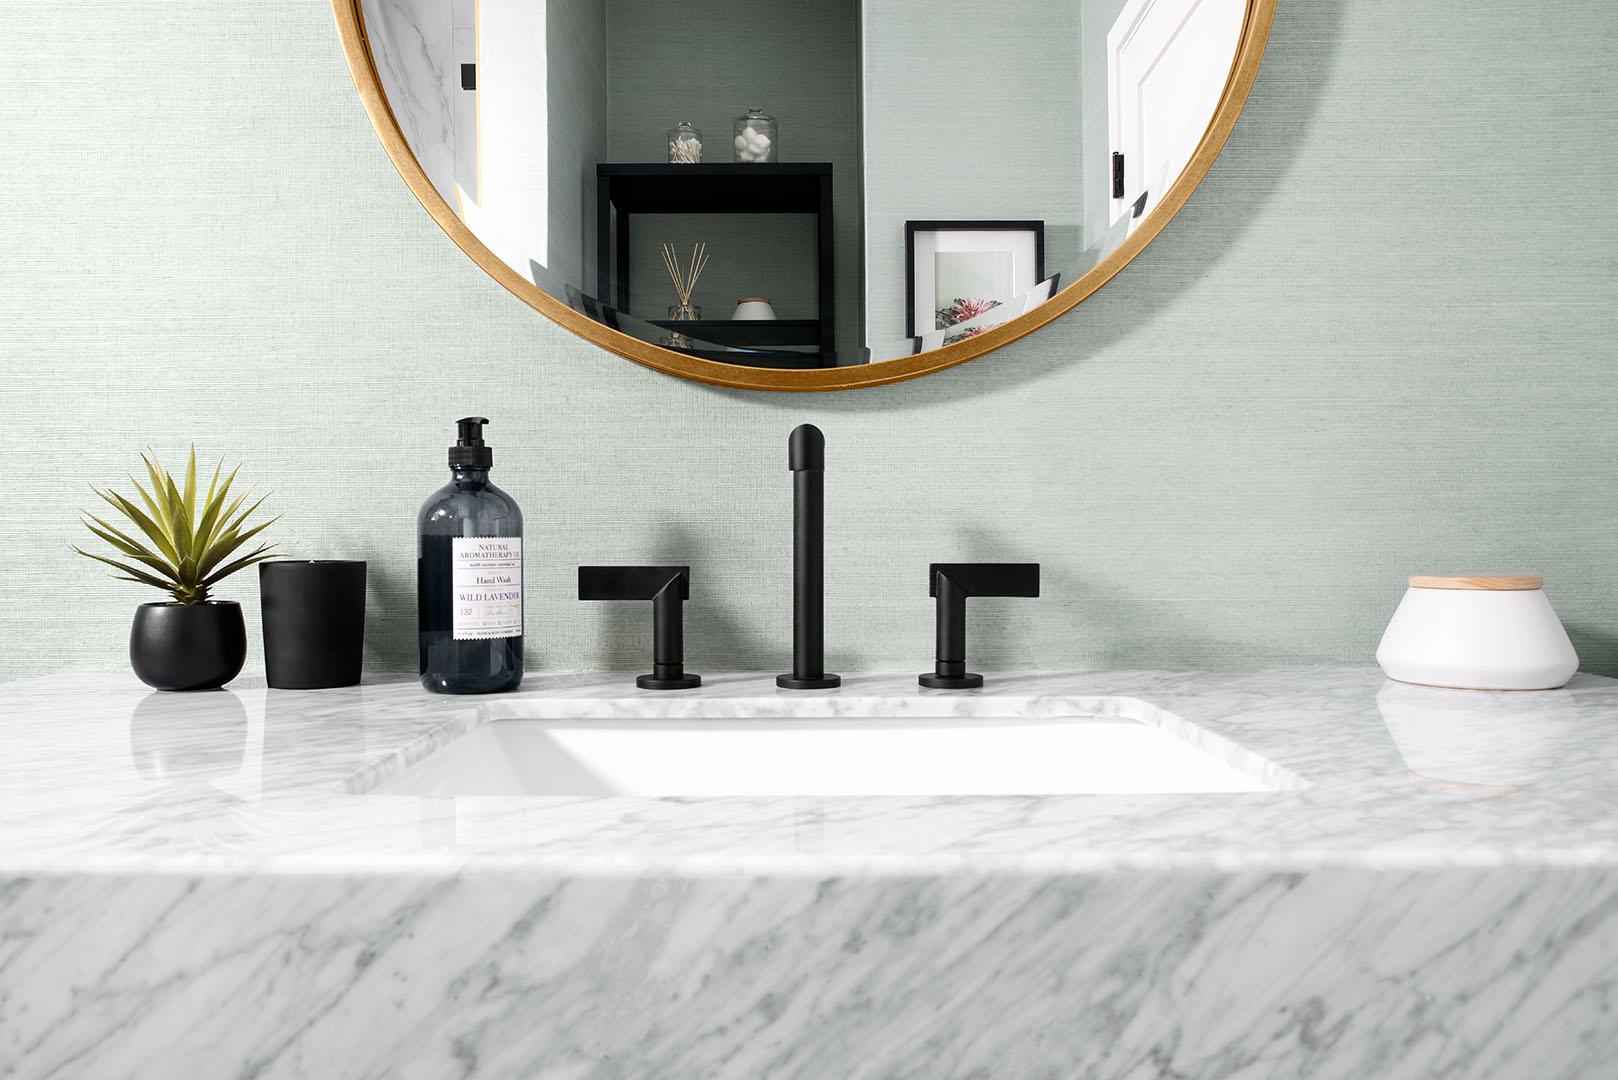 Master bathroom sink design in Oakland, CA